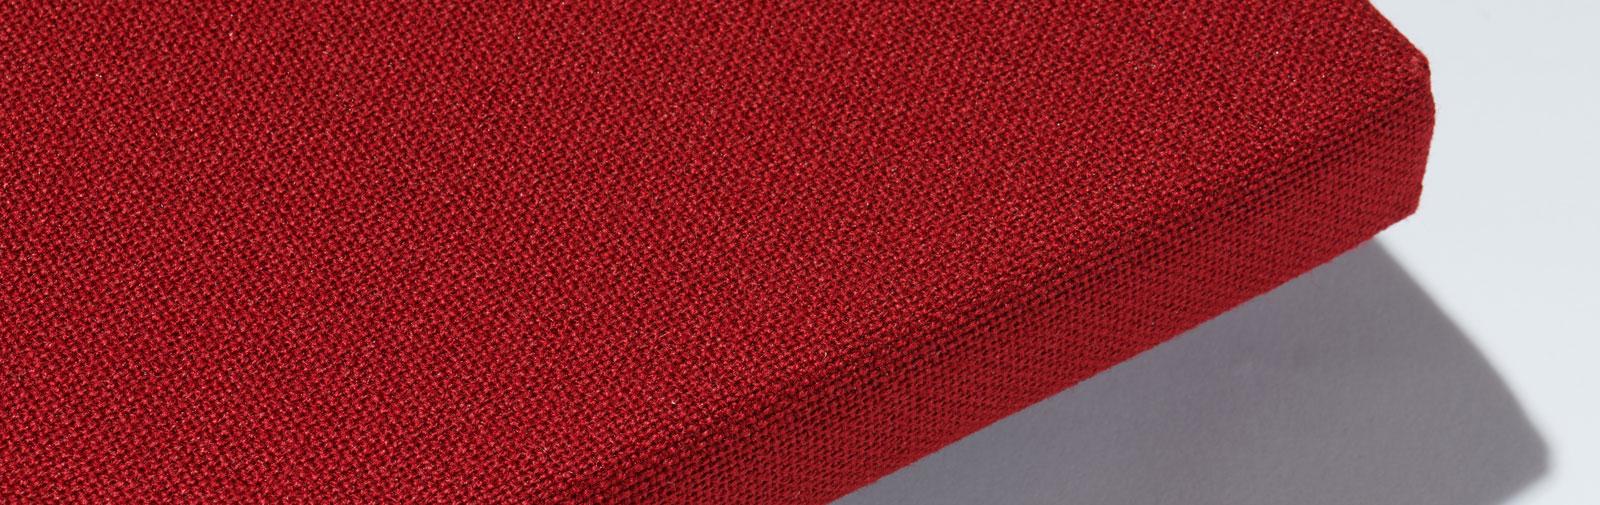 coussin Bankauflage Simplex 40 mm code couleur 7120 couleur rouge clair